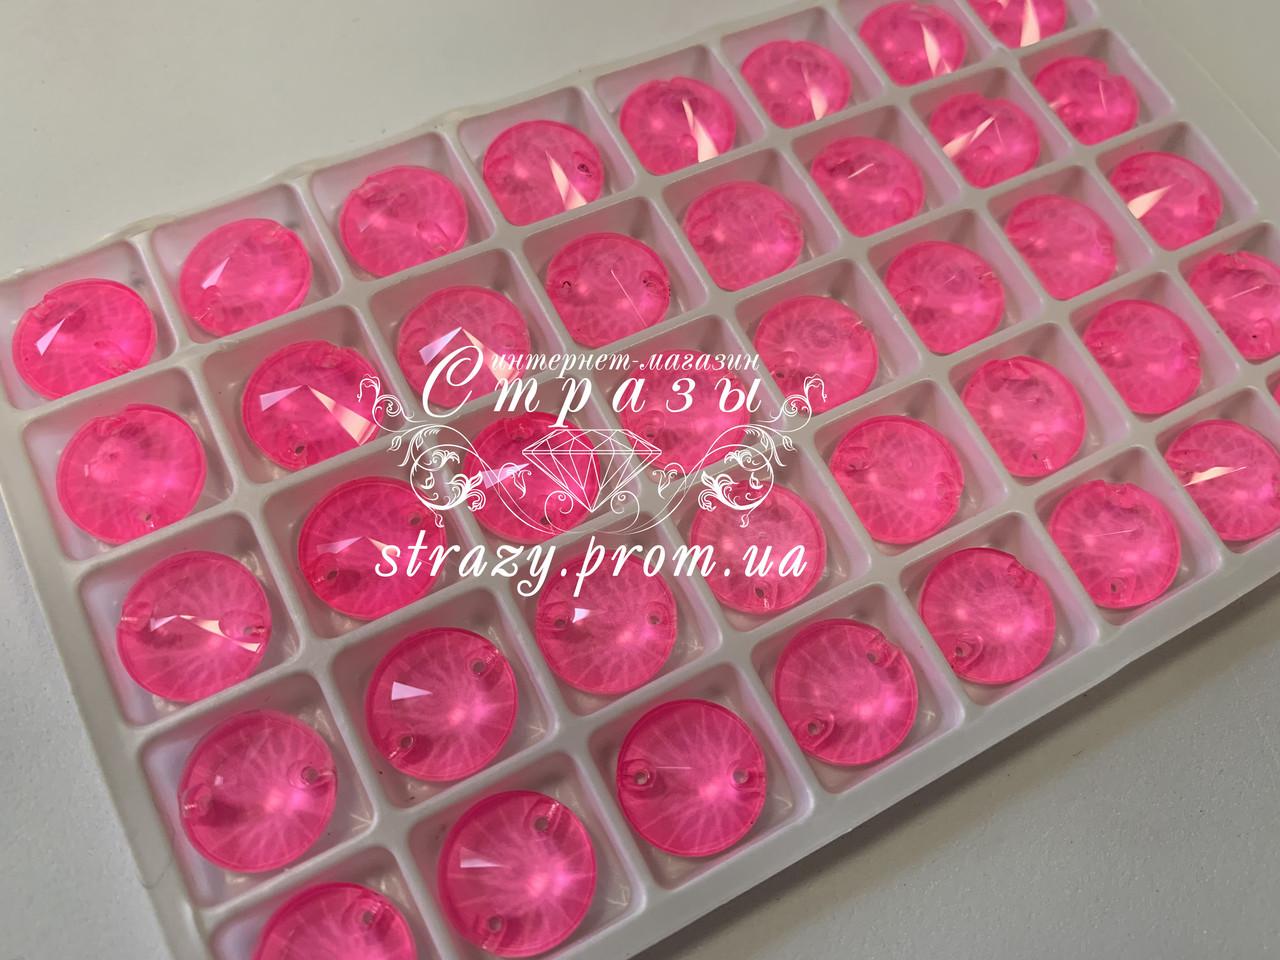 Стразы пришивные SWARO Круги 12мм. Neon Pink